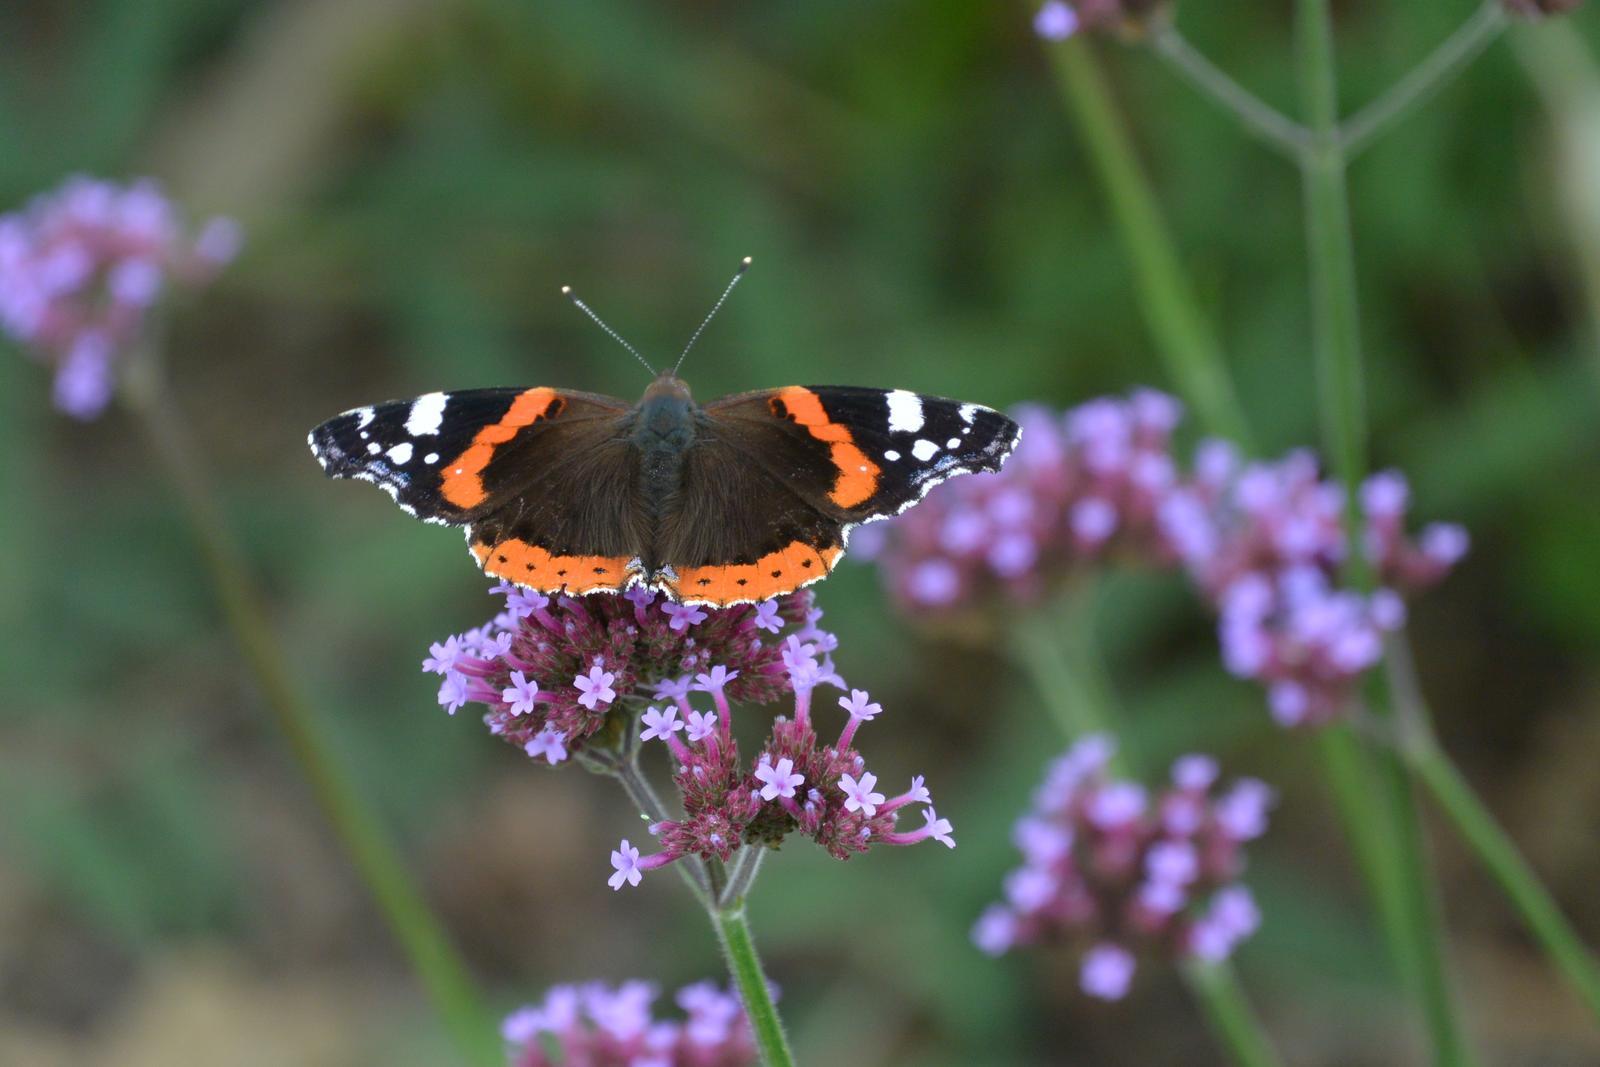 Motýlí zahrada 2019-2020 - Obrázek č. 55